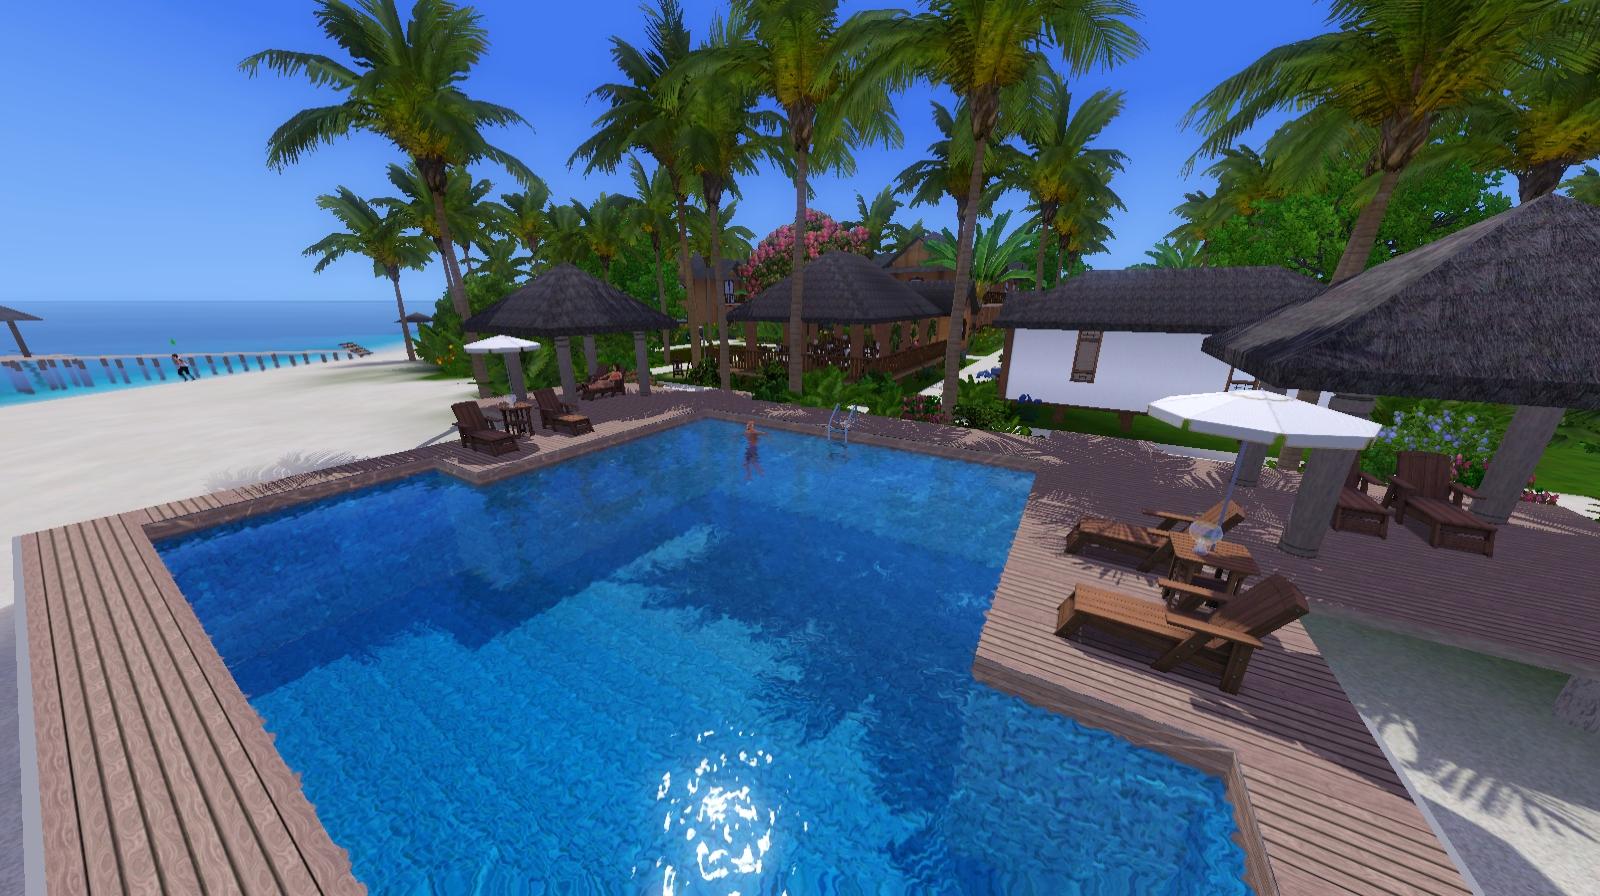 [Descarga] Mundo Suvadiva Resort, poblado. Screenshot-490